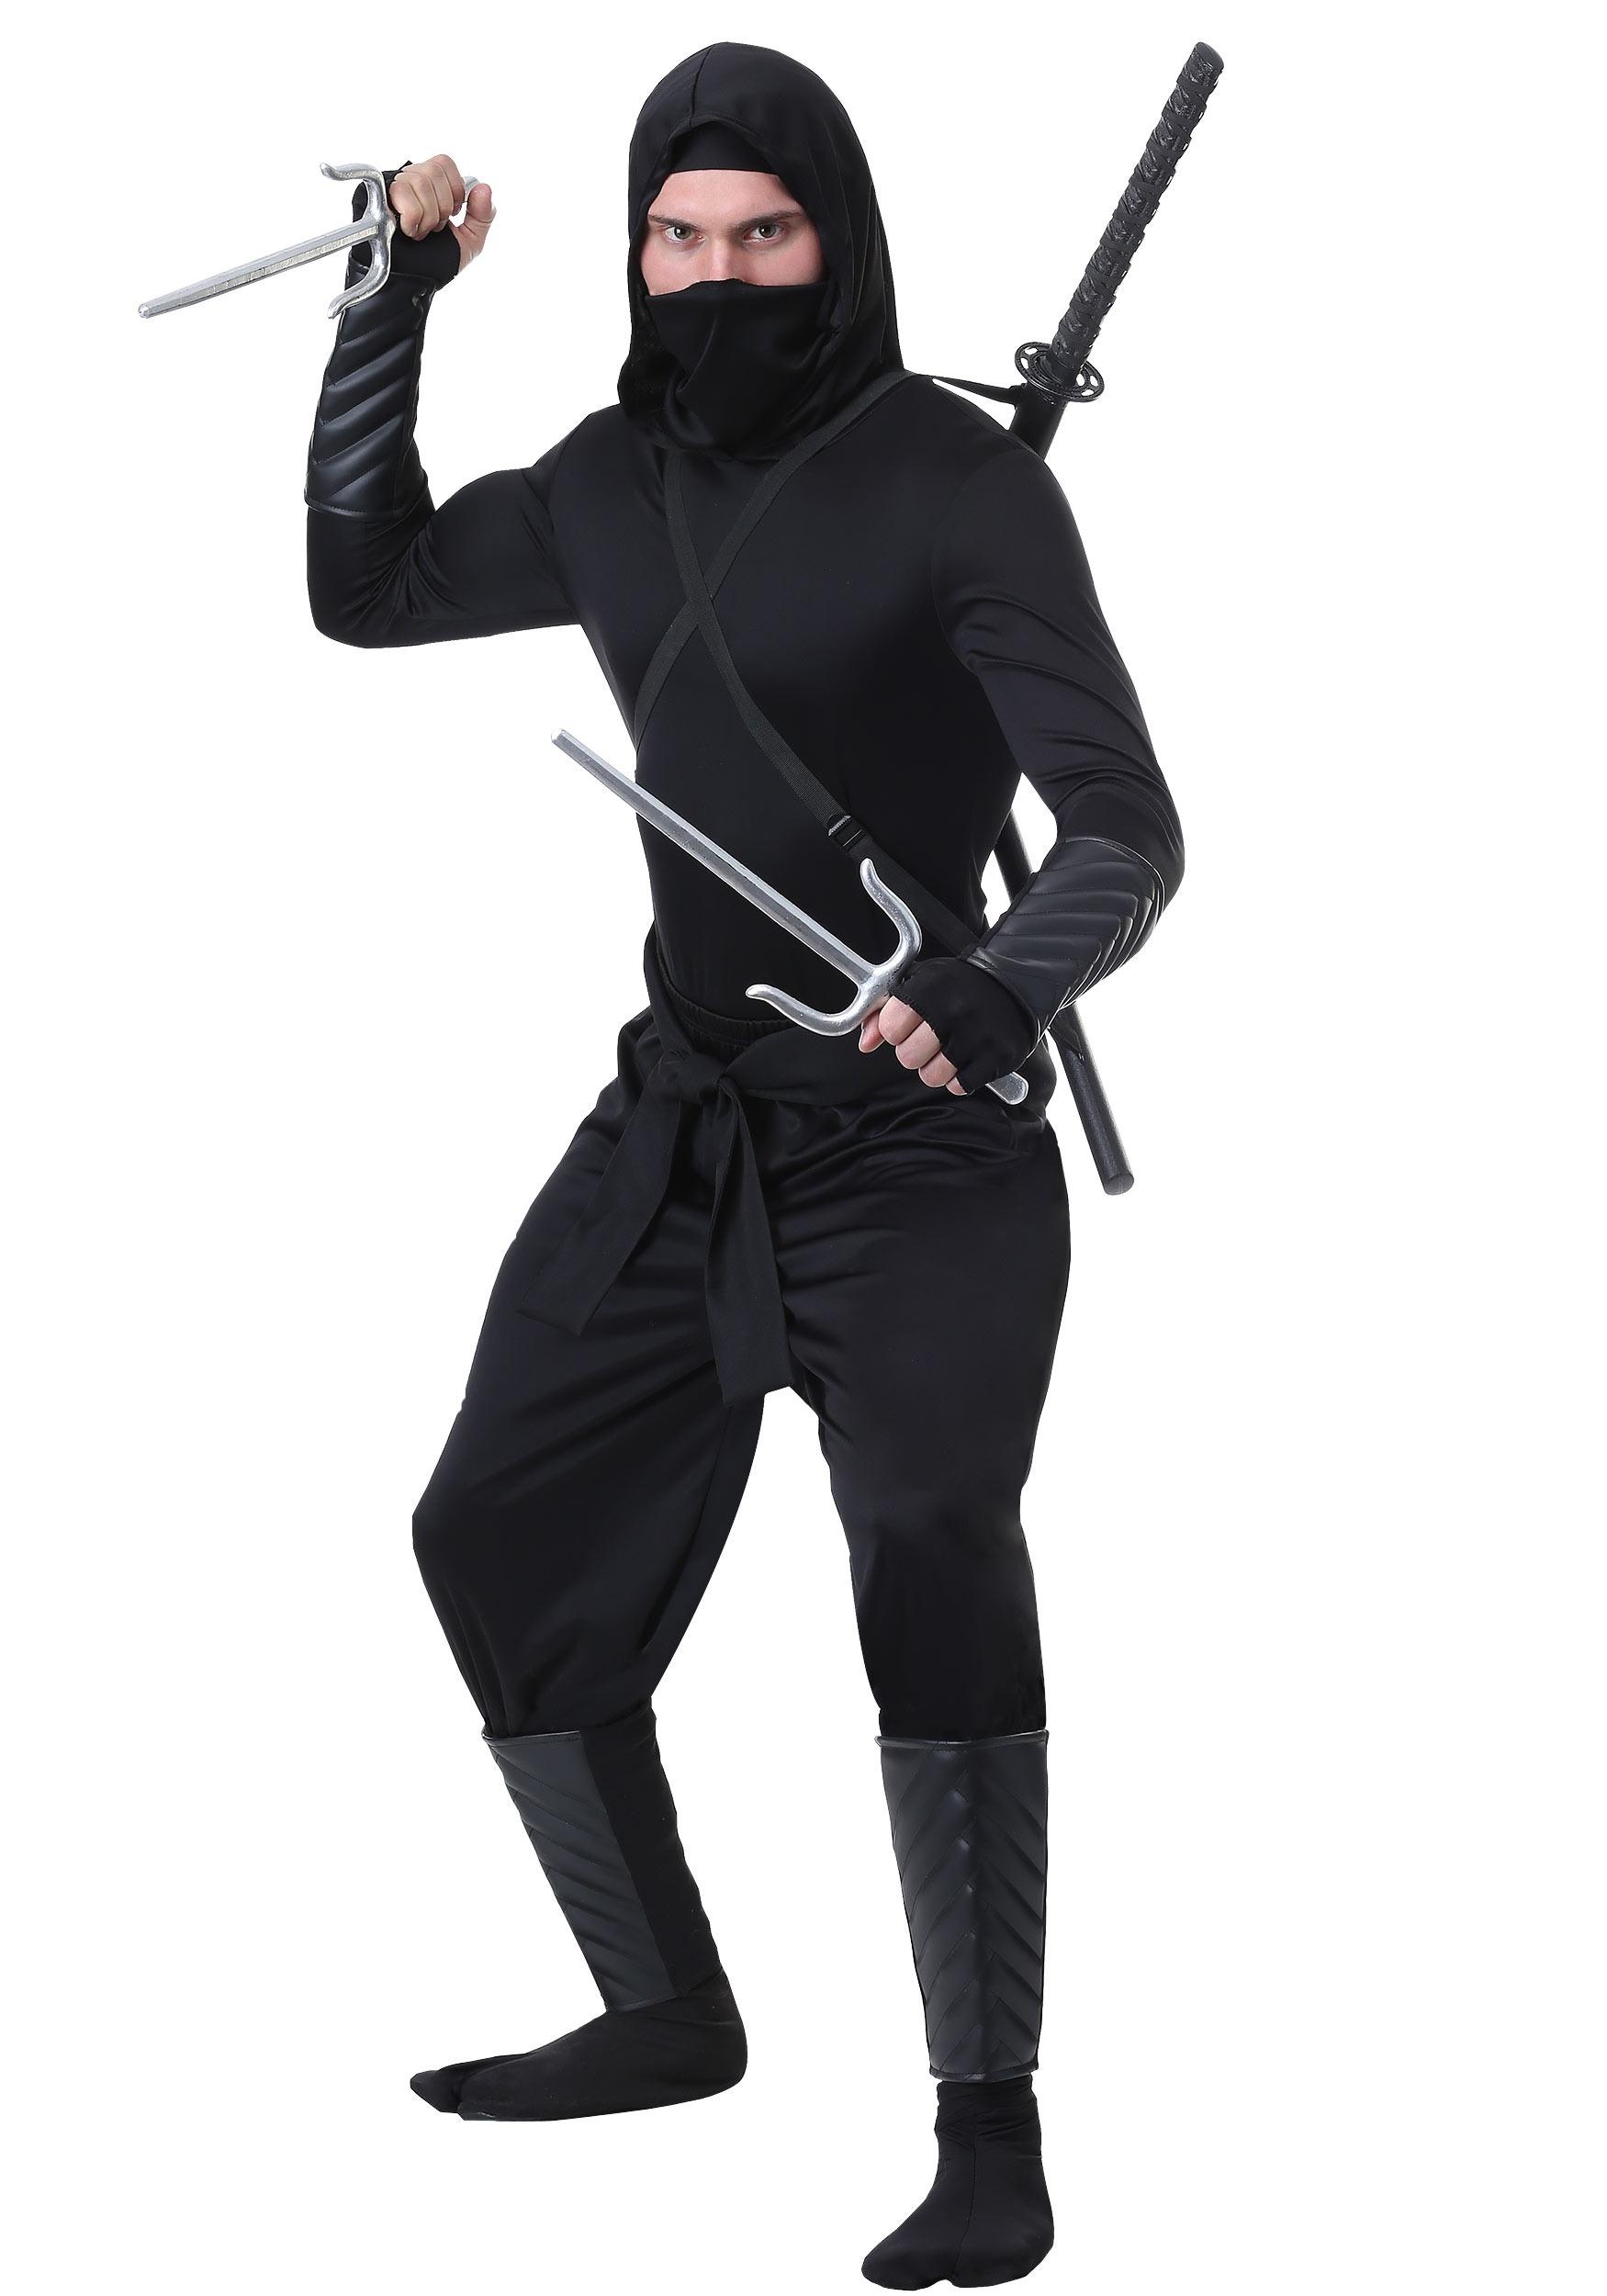 Stealth Shinobi Ninja Costume for Adults